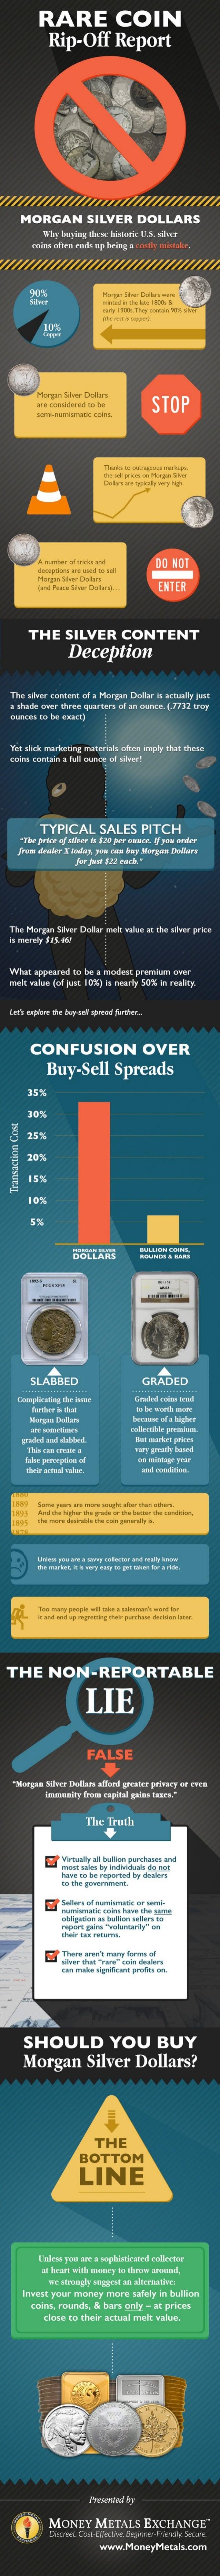 RARE COIN Rip-Off Report     Z&ZZQZZ2Z&Zozo0ZZQZ%ZZ2ZZ  MORGAN SILVER DOLLARS  Why buying these historic U. S. silver coin...